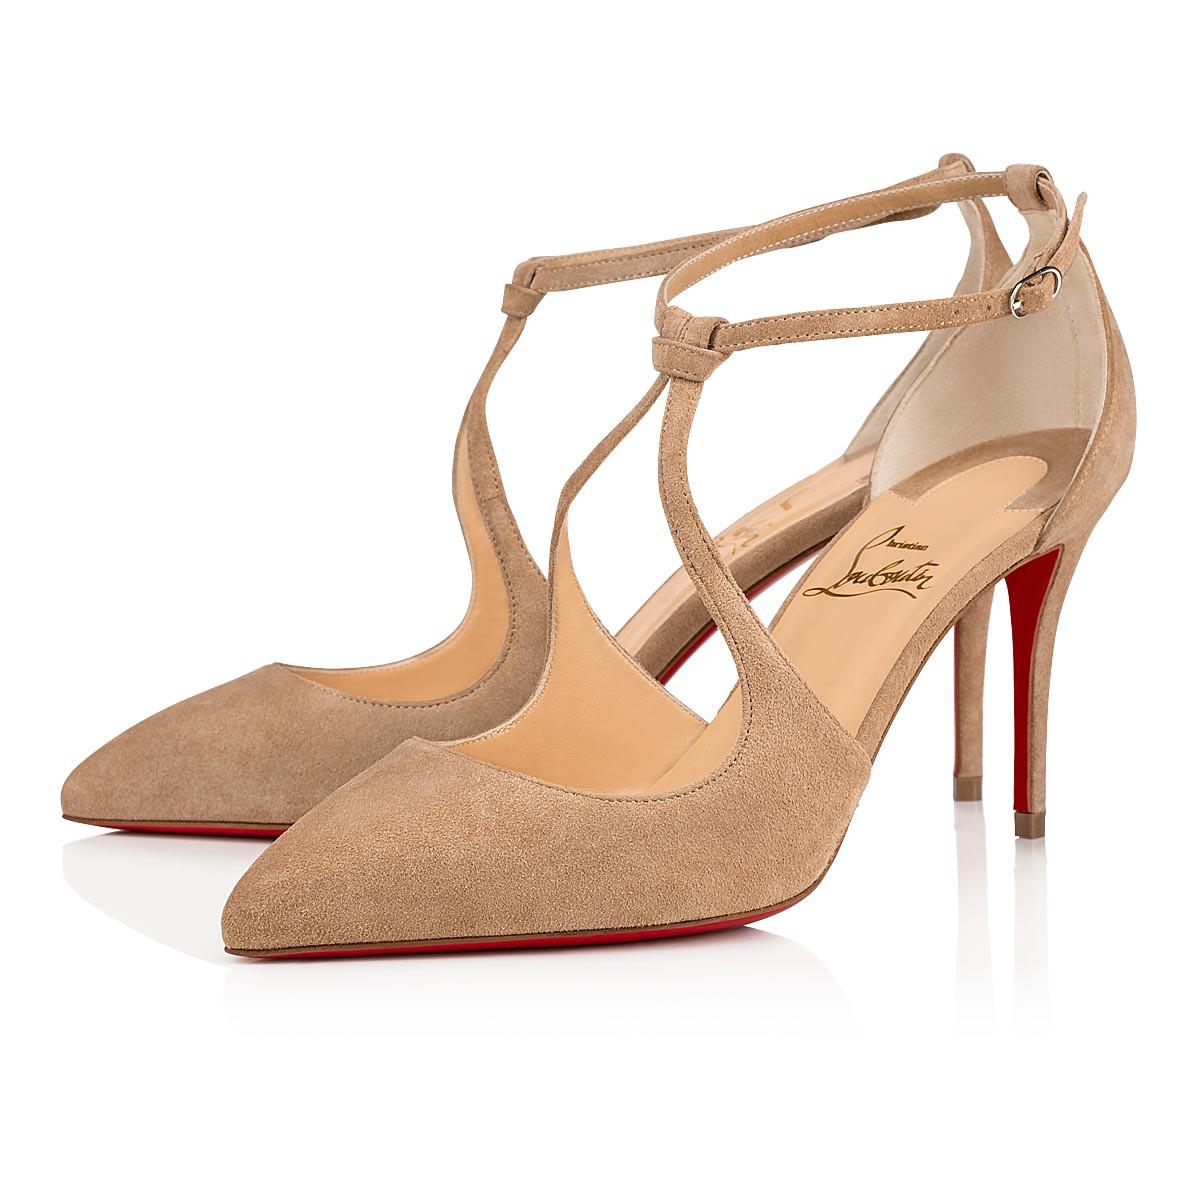 Alminetta 85 Nocciola Suede Women Shoes Christian Louboutin En